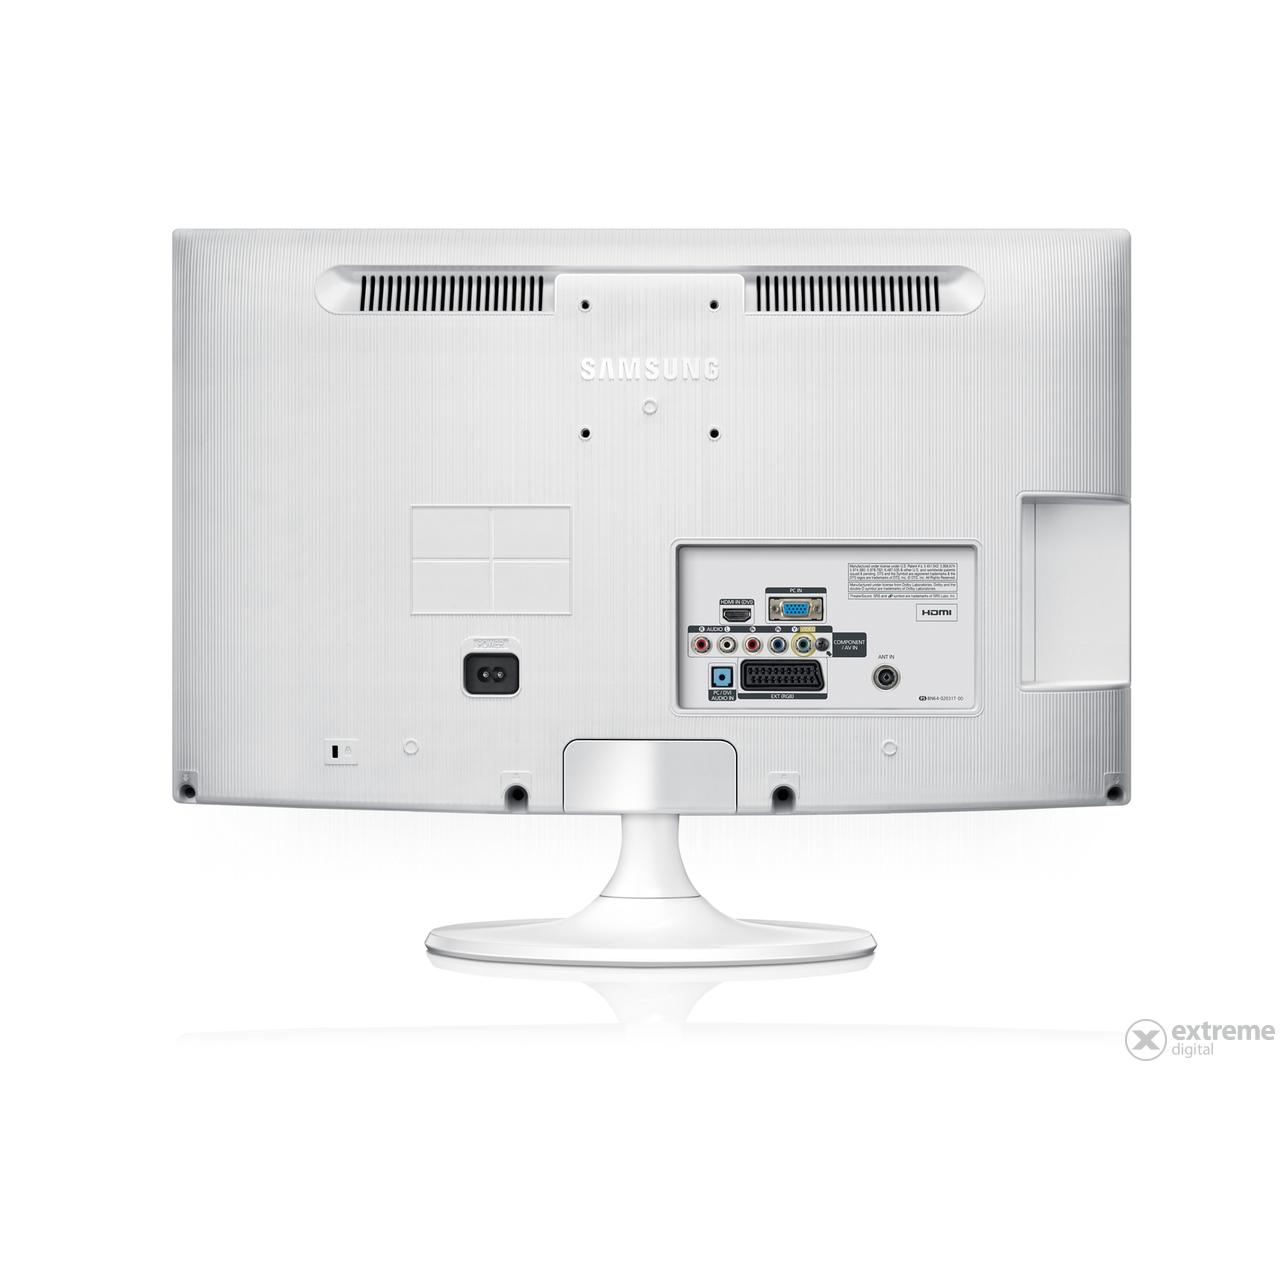 b1c3e225e Samsung T24B300EE LED biely | Extreme Digital